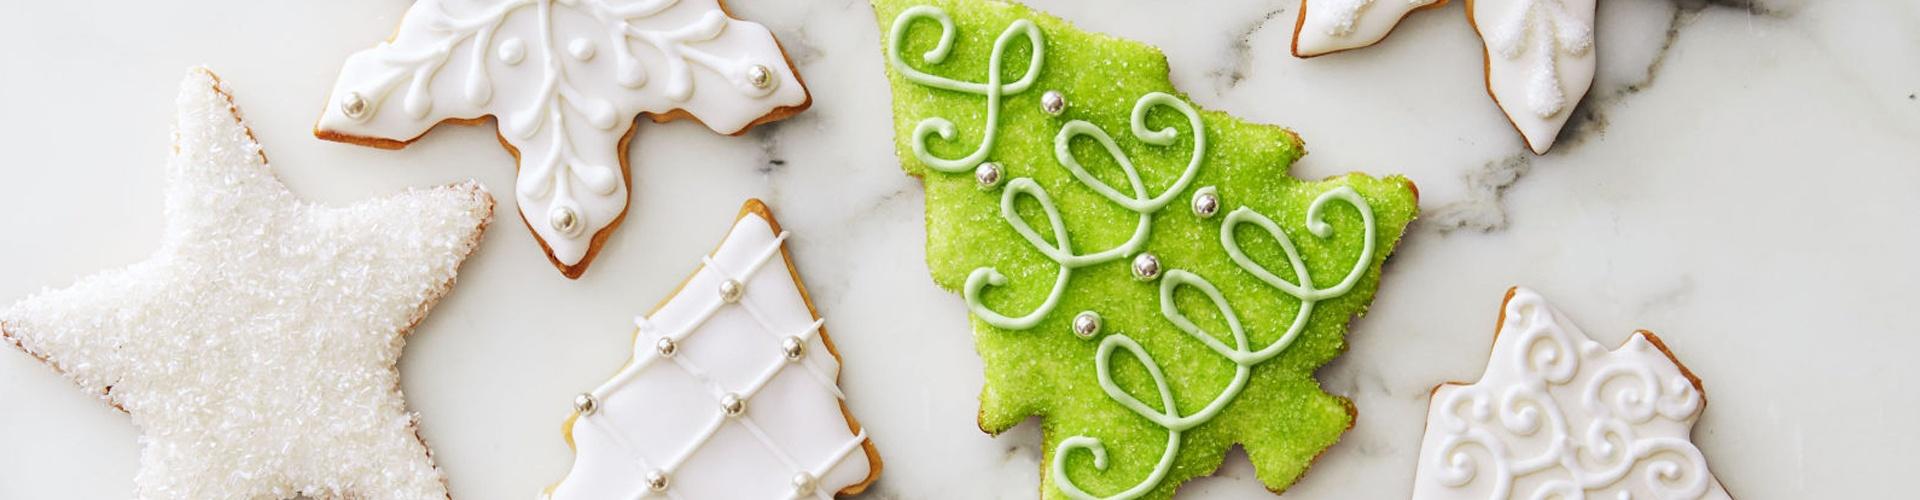 Dixon Staff Holiday Recipes